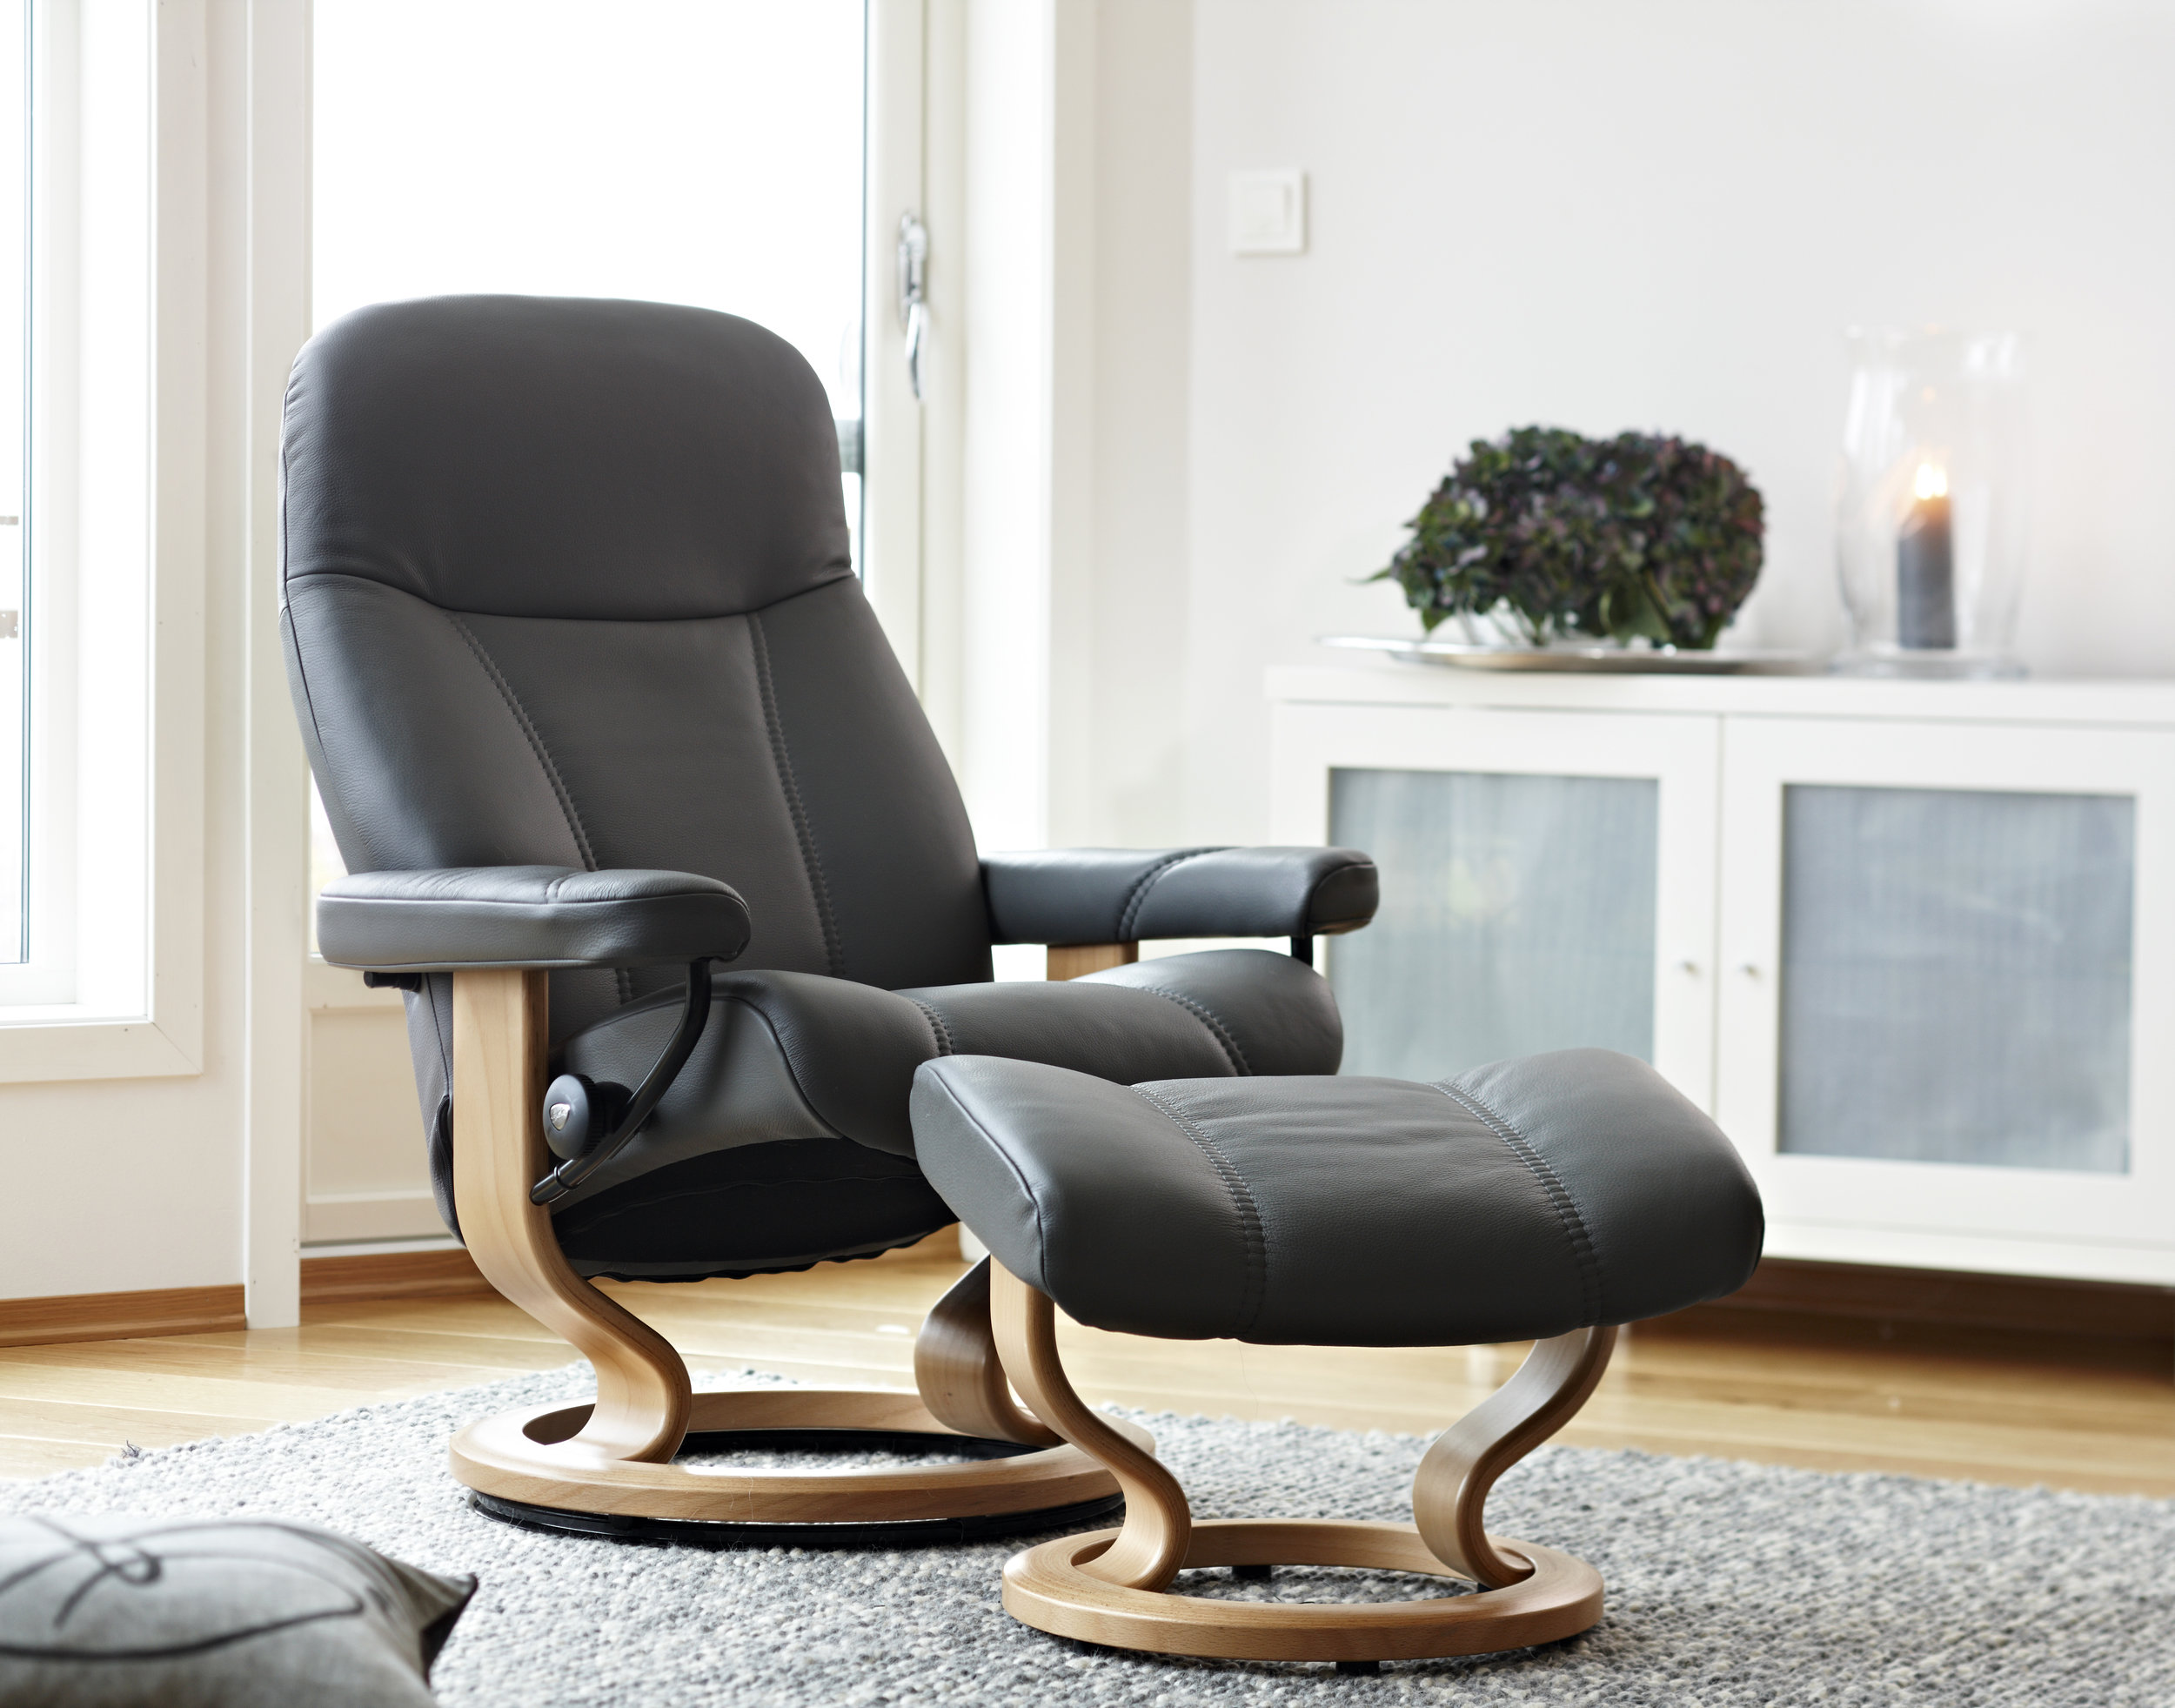 Stressless Consul - Stressless Chair